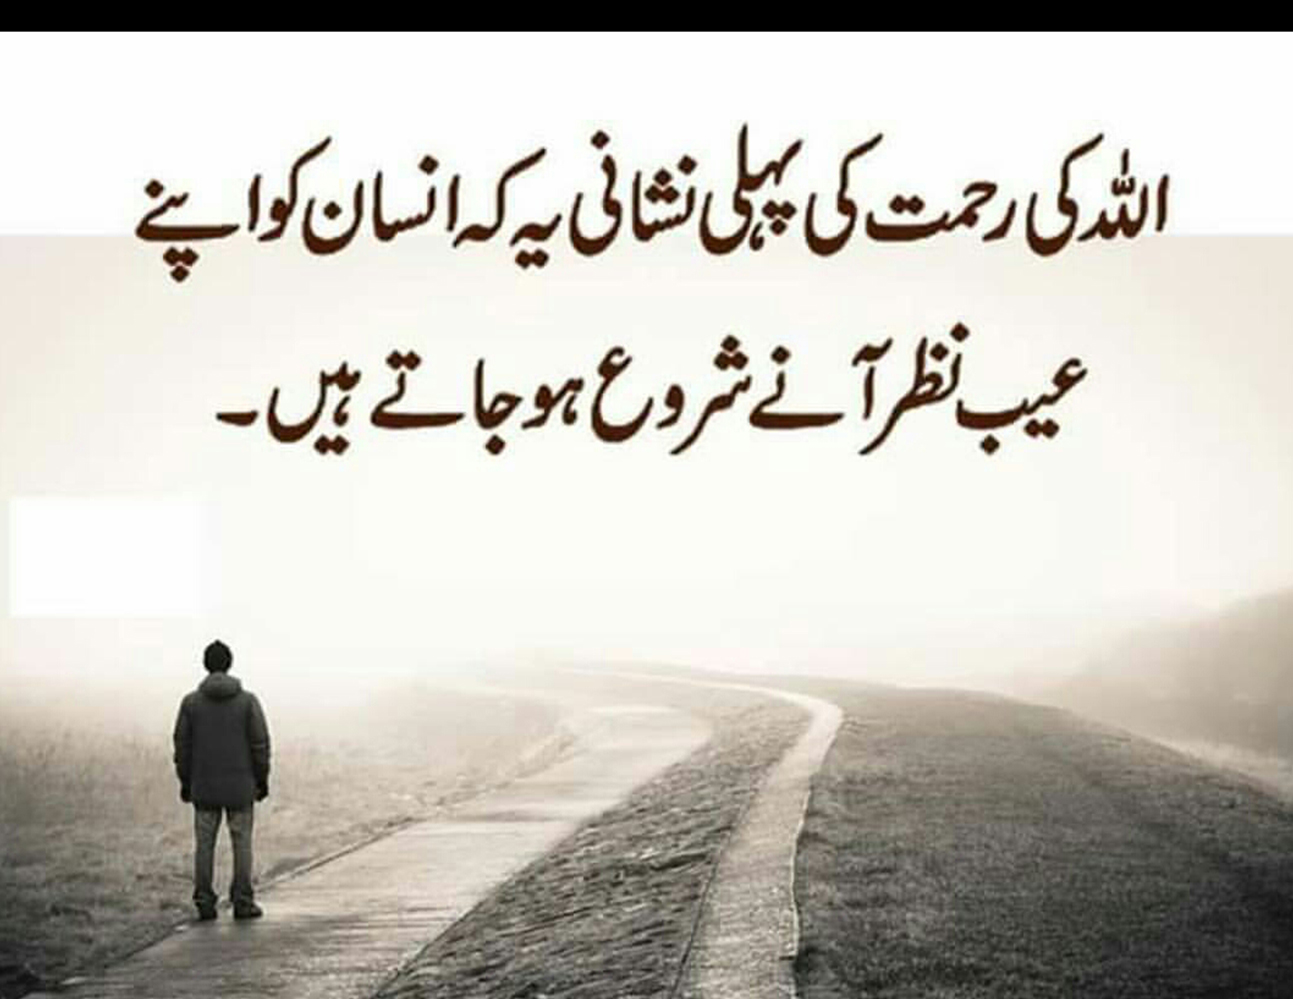 Beautiful Saying Quotes In Urdu Wallpapers Photos